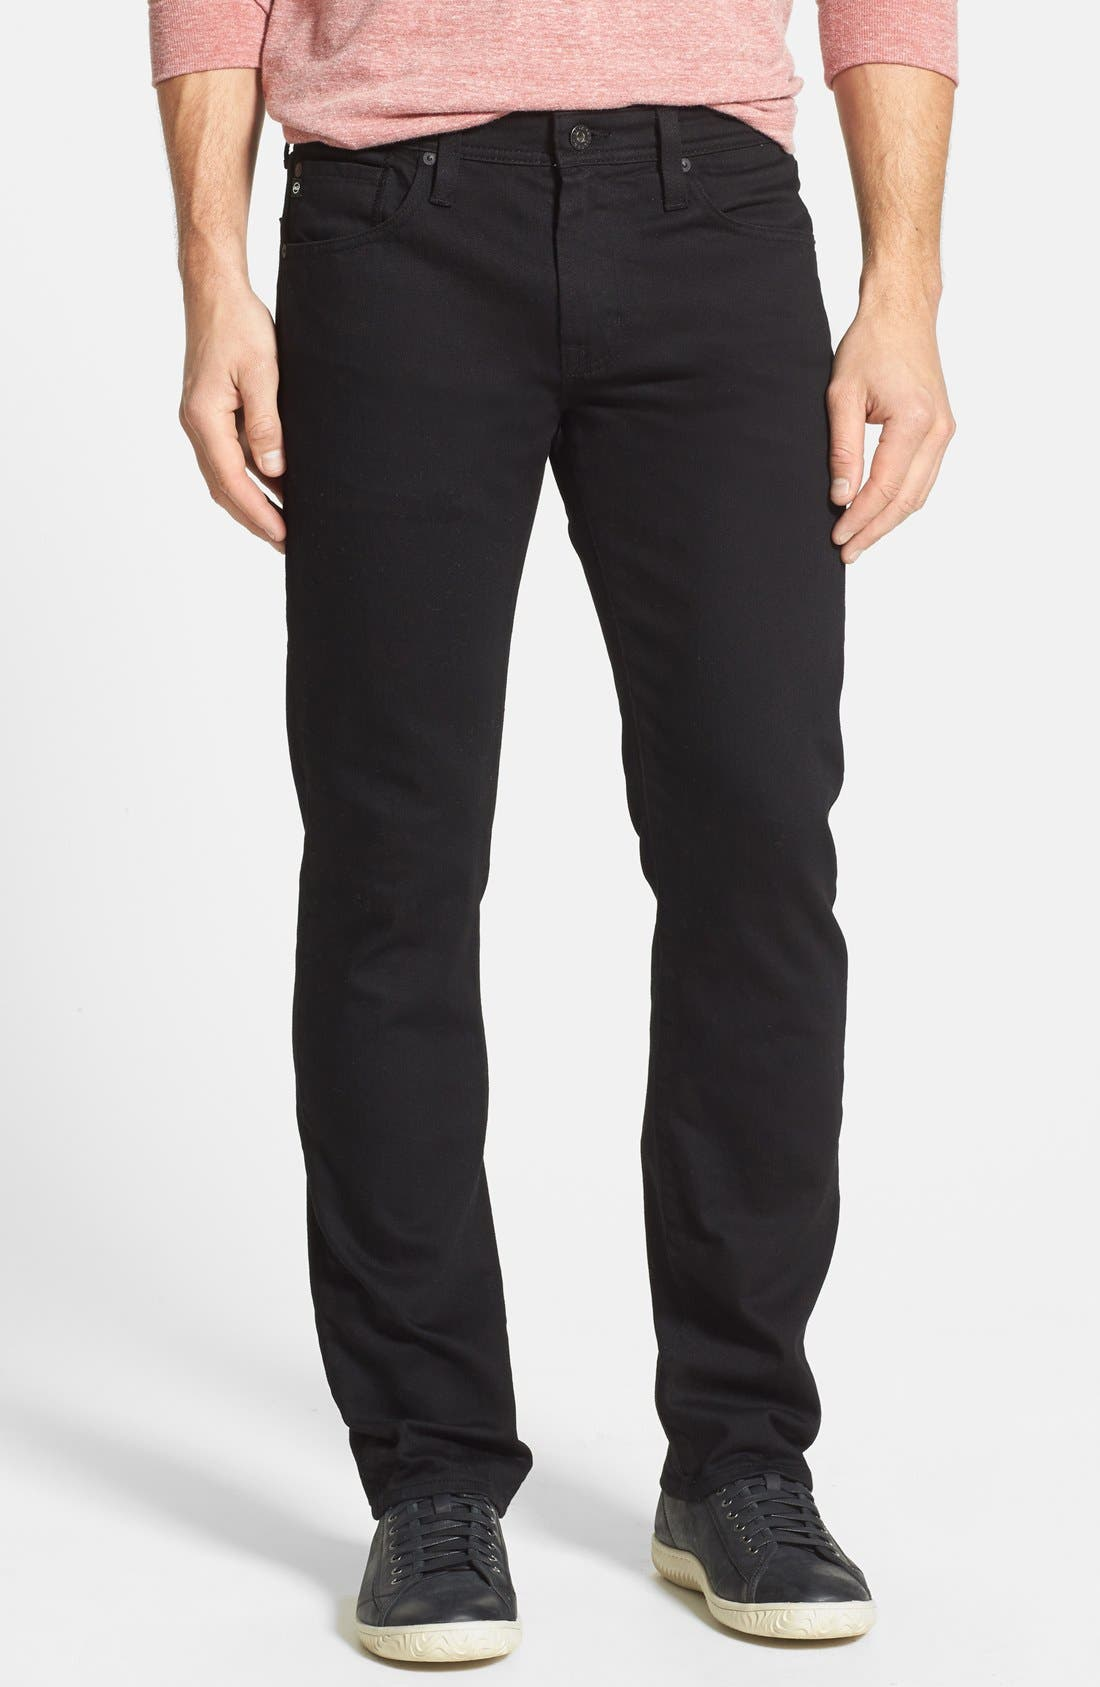 Alternate Image 1 Selected - AG 'Matchbox' Slim Fit Jeans (Blackheart)